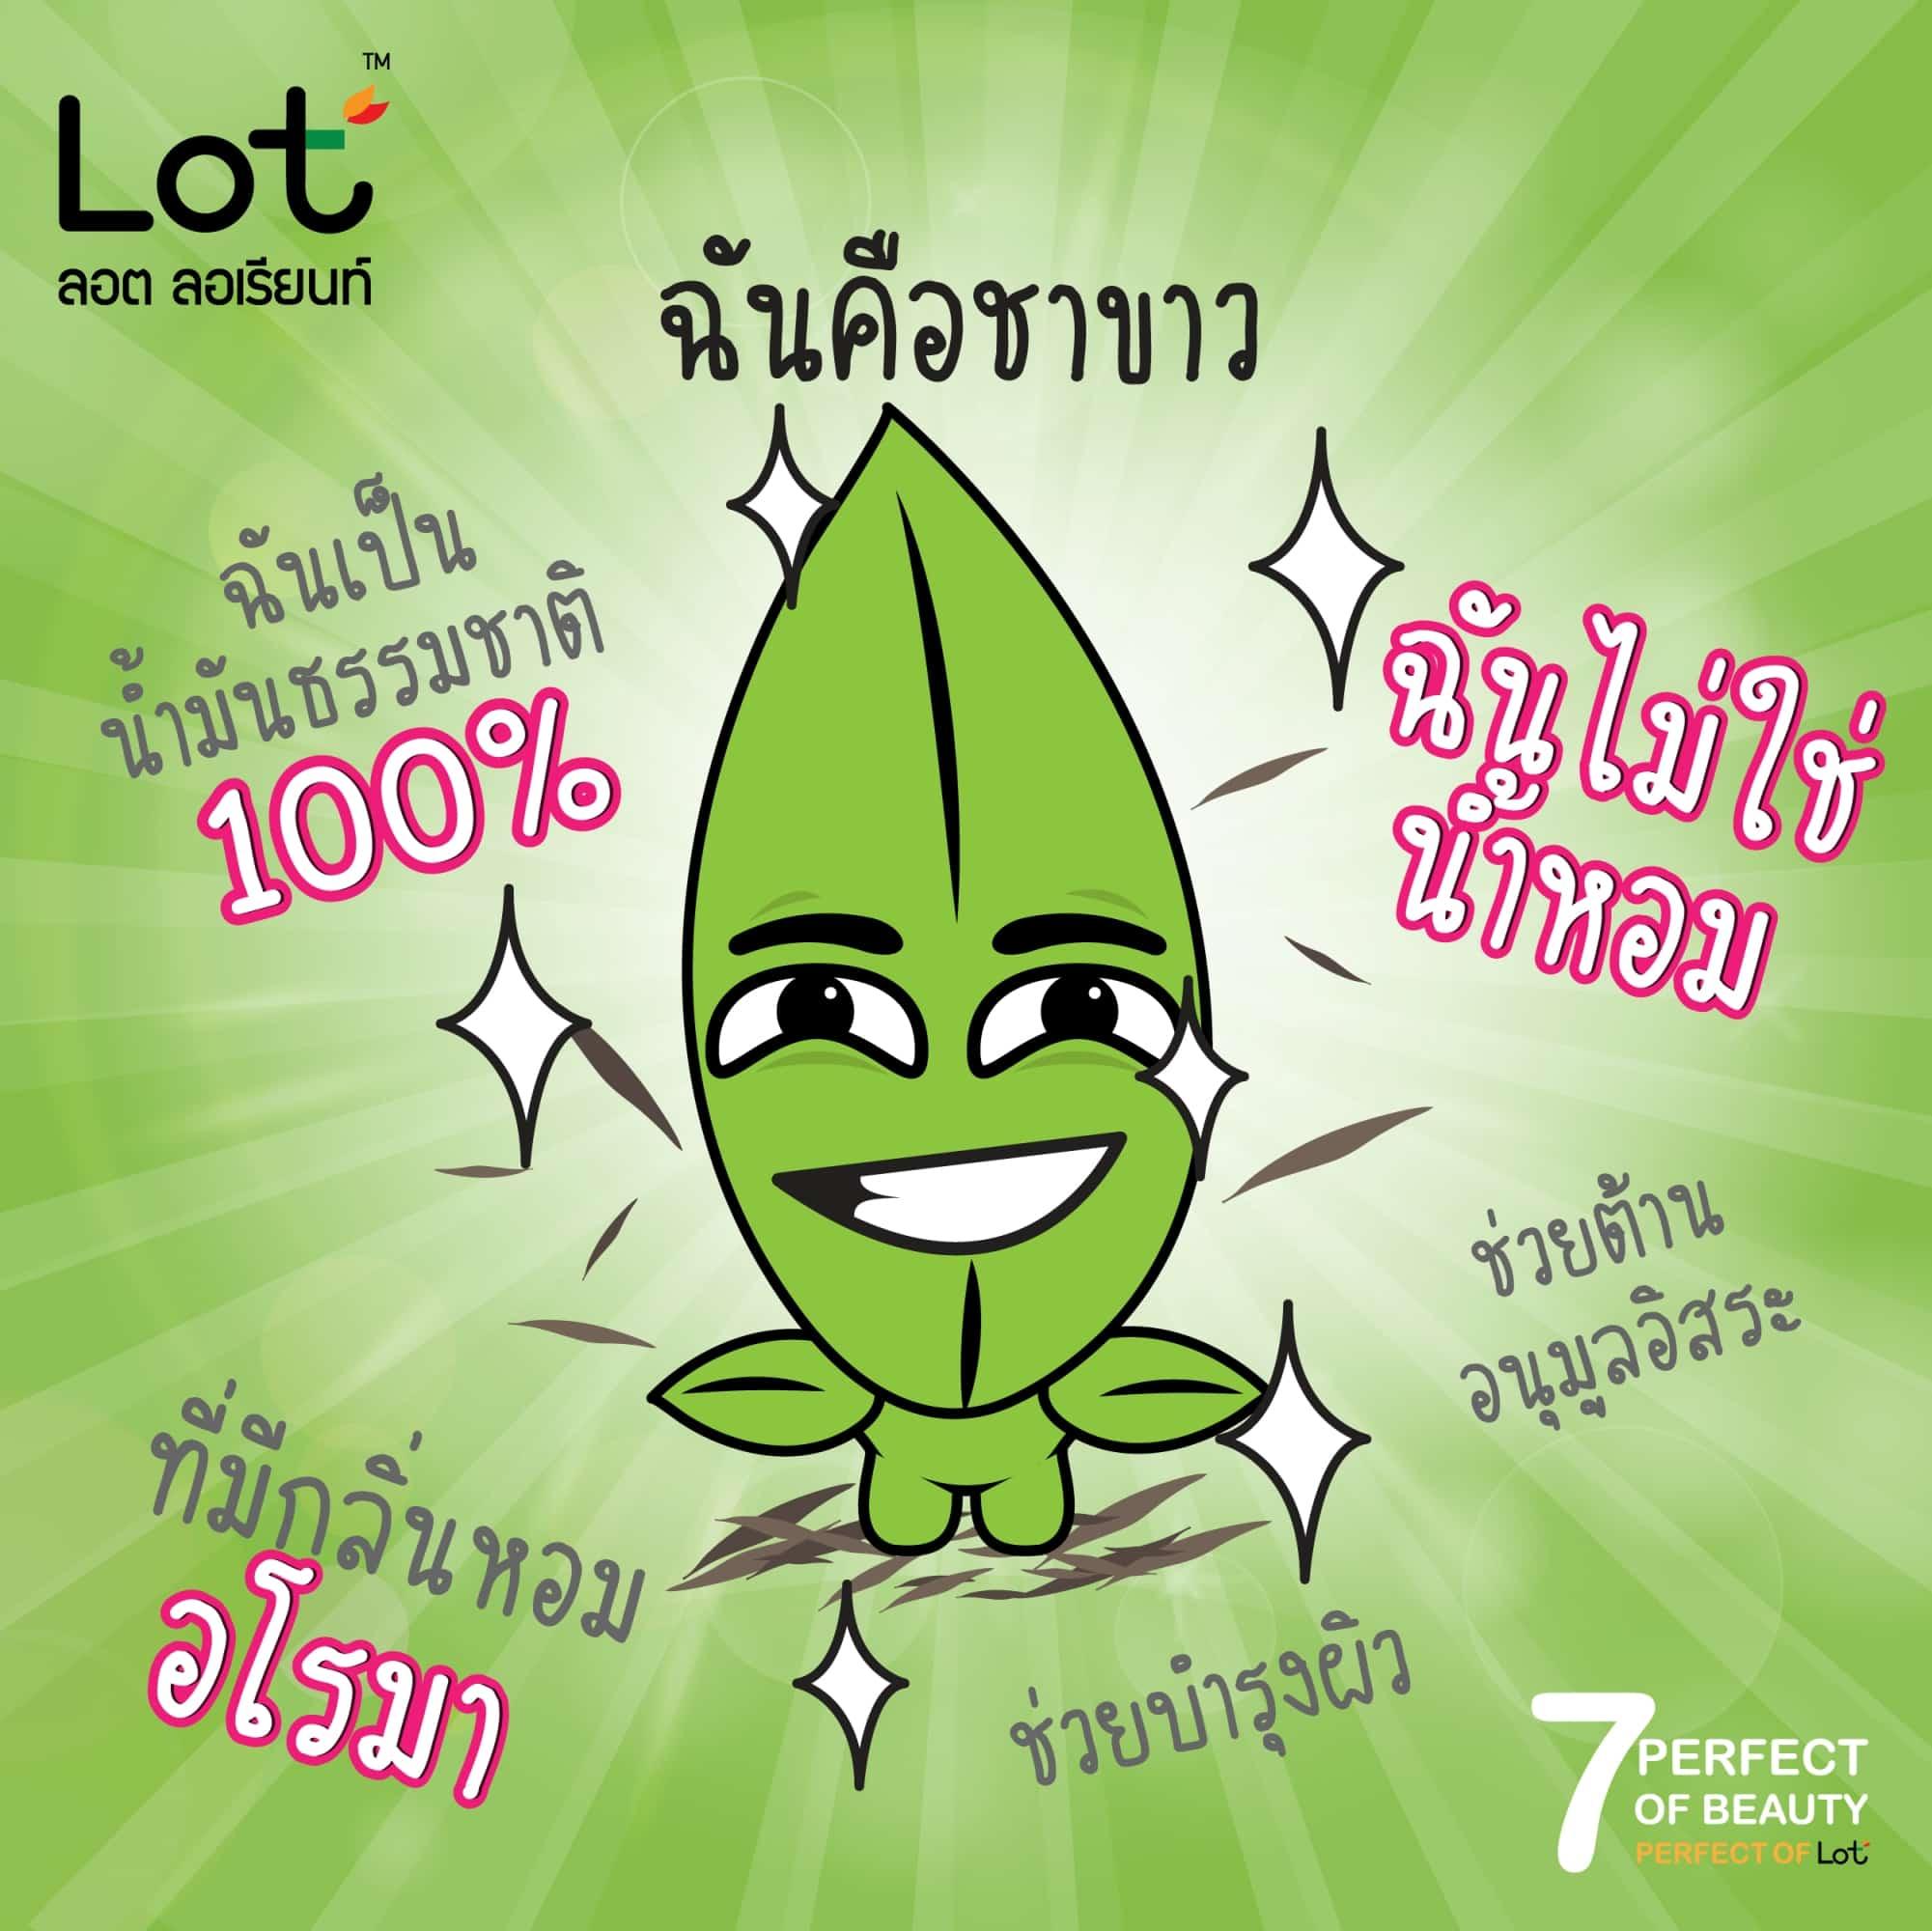 7 perfect story of LOT หรือ สารสกัดธรรมชาติ 7 สิ่งมหัศจรรย์